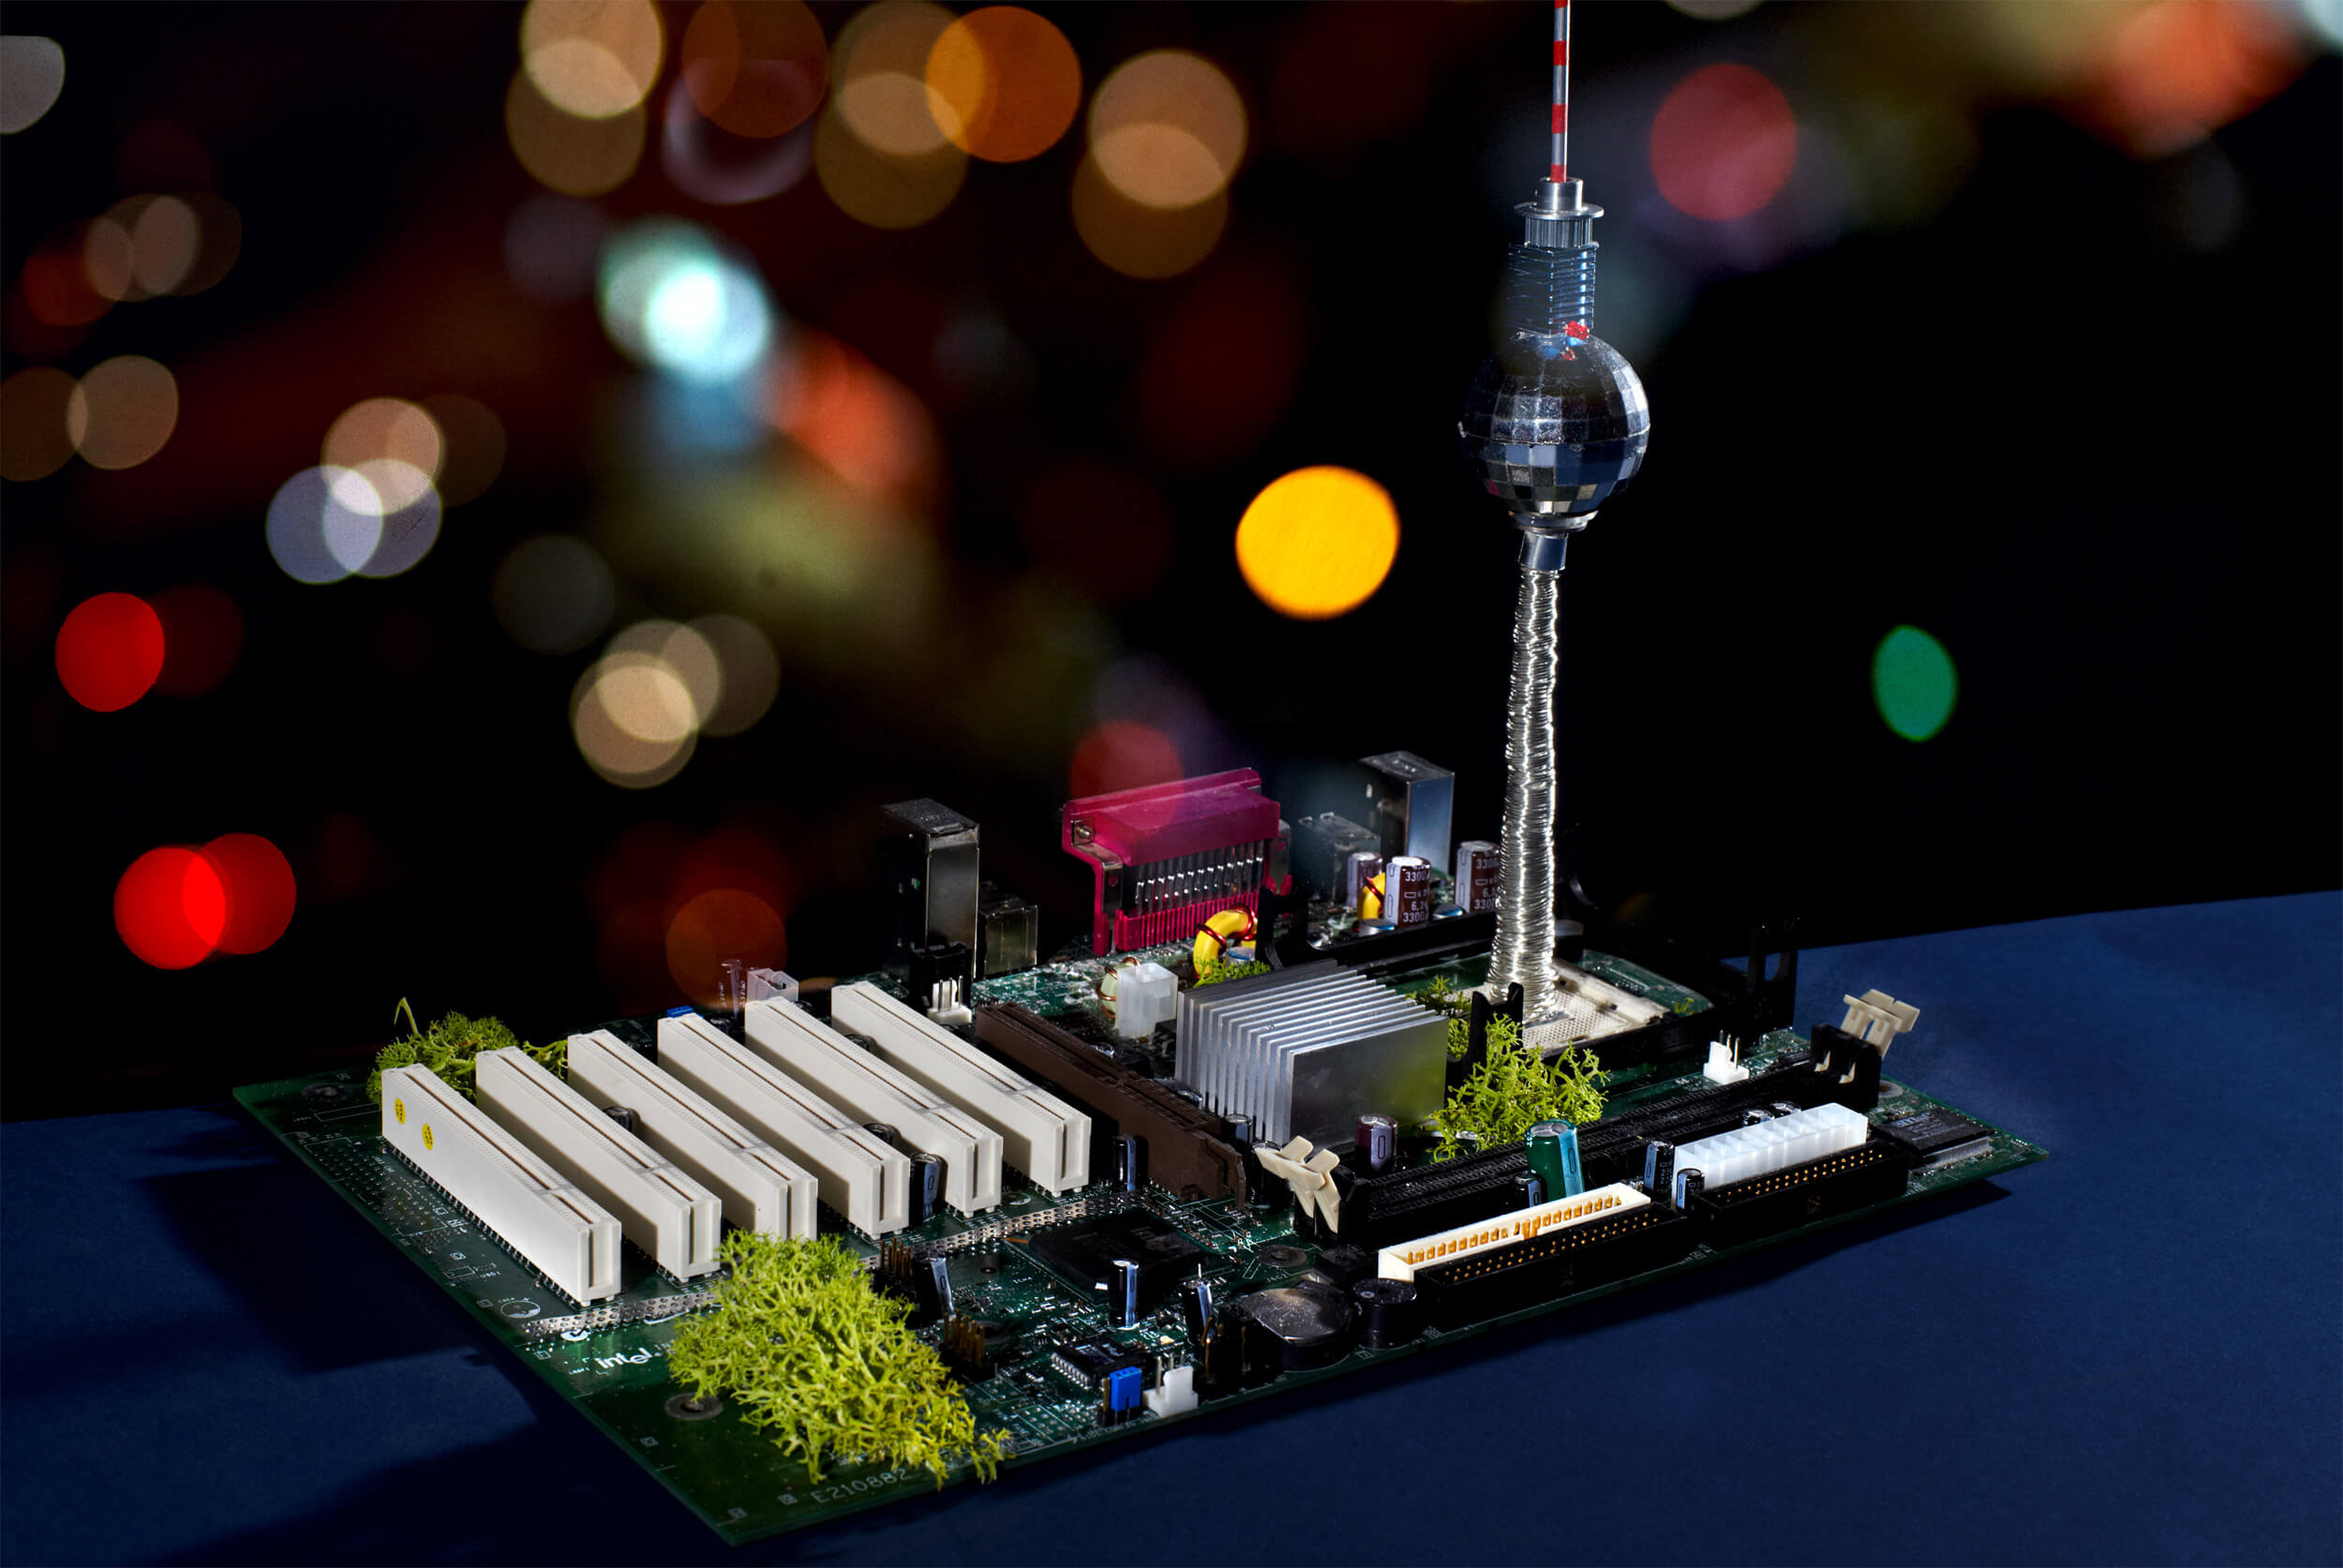 wired_tactileillustration_berlin_katrinrodegast_web